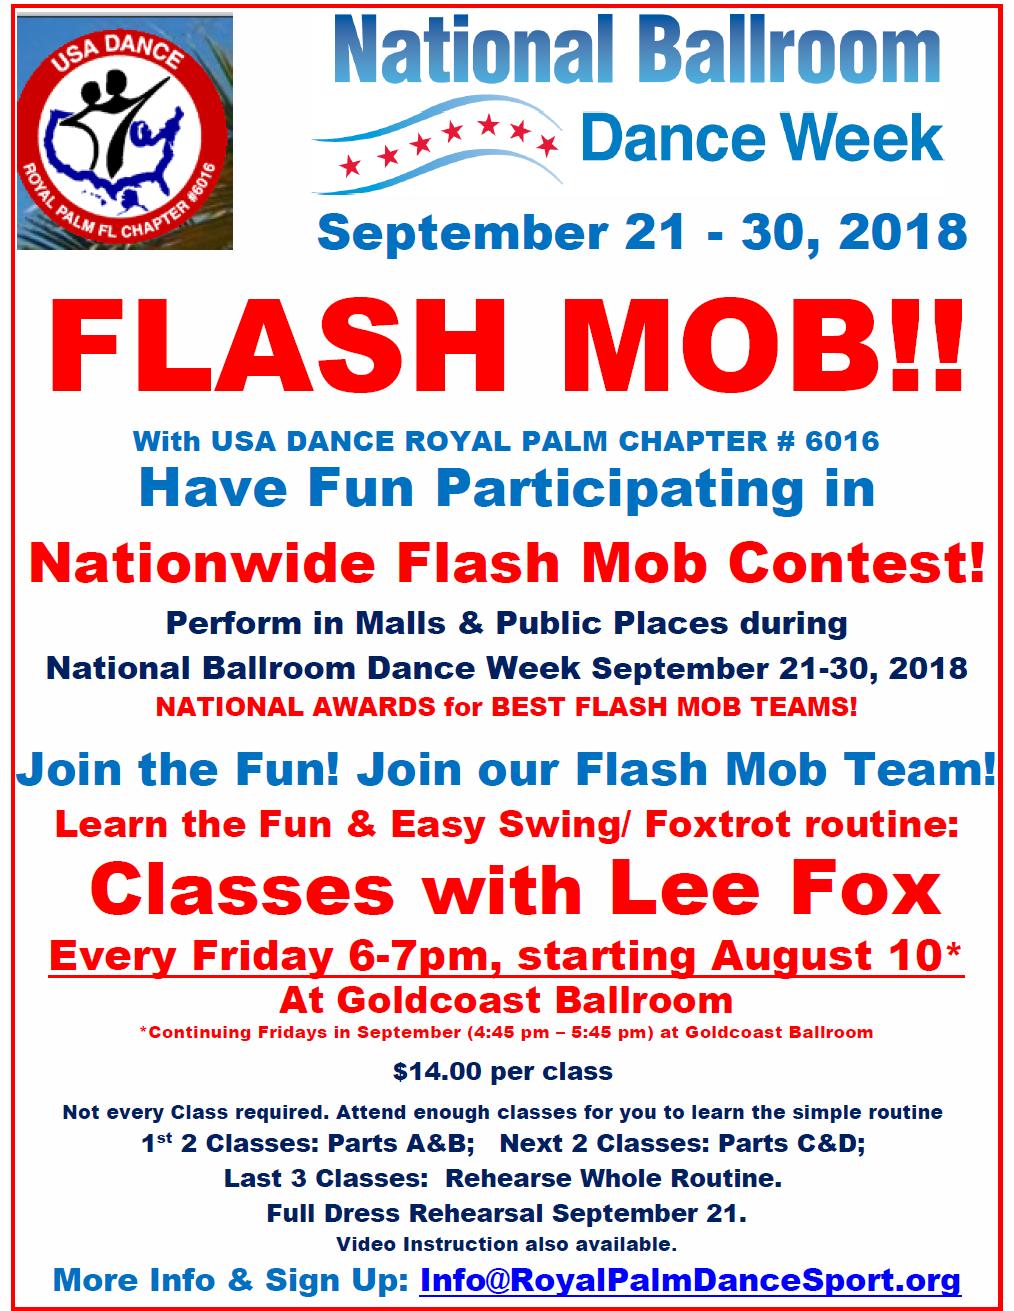 Flash Mob for National Ballroom Dance Week - Classes Start Friday, August 10 (6-7pm) at Goldcoast Ballroom